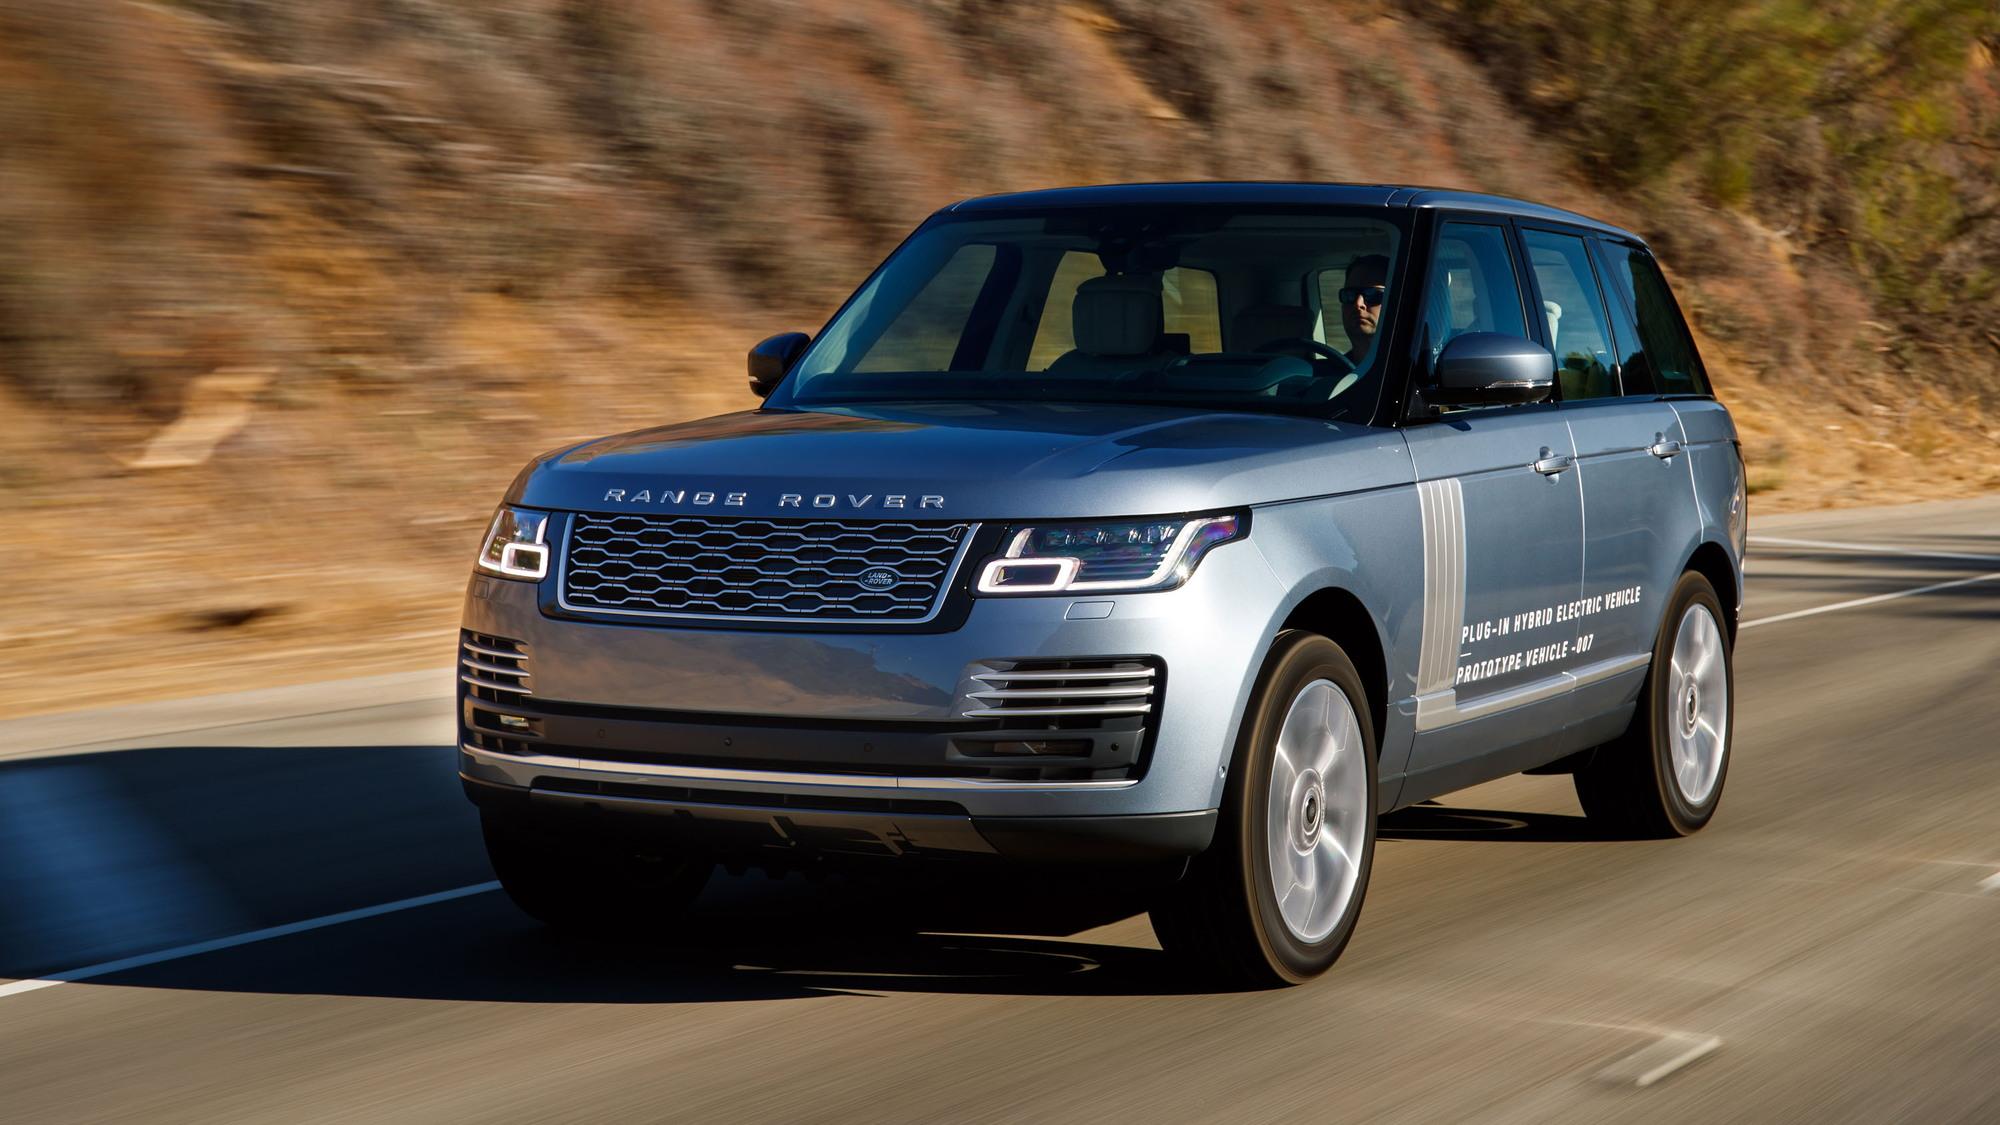 2019 Land Rover Range Rover Sport: PHEV Version, Changes, Price >> 2019 Land Rover Range Rover Phev First Drive London Here S